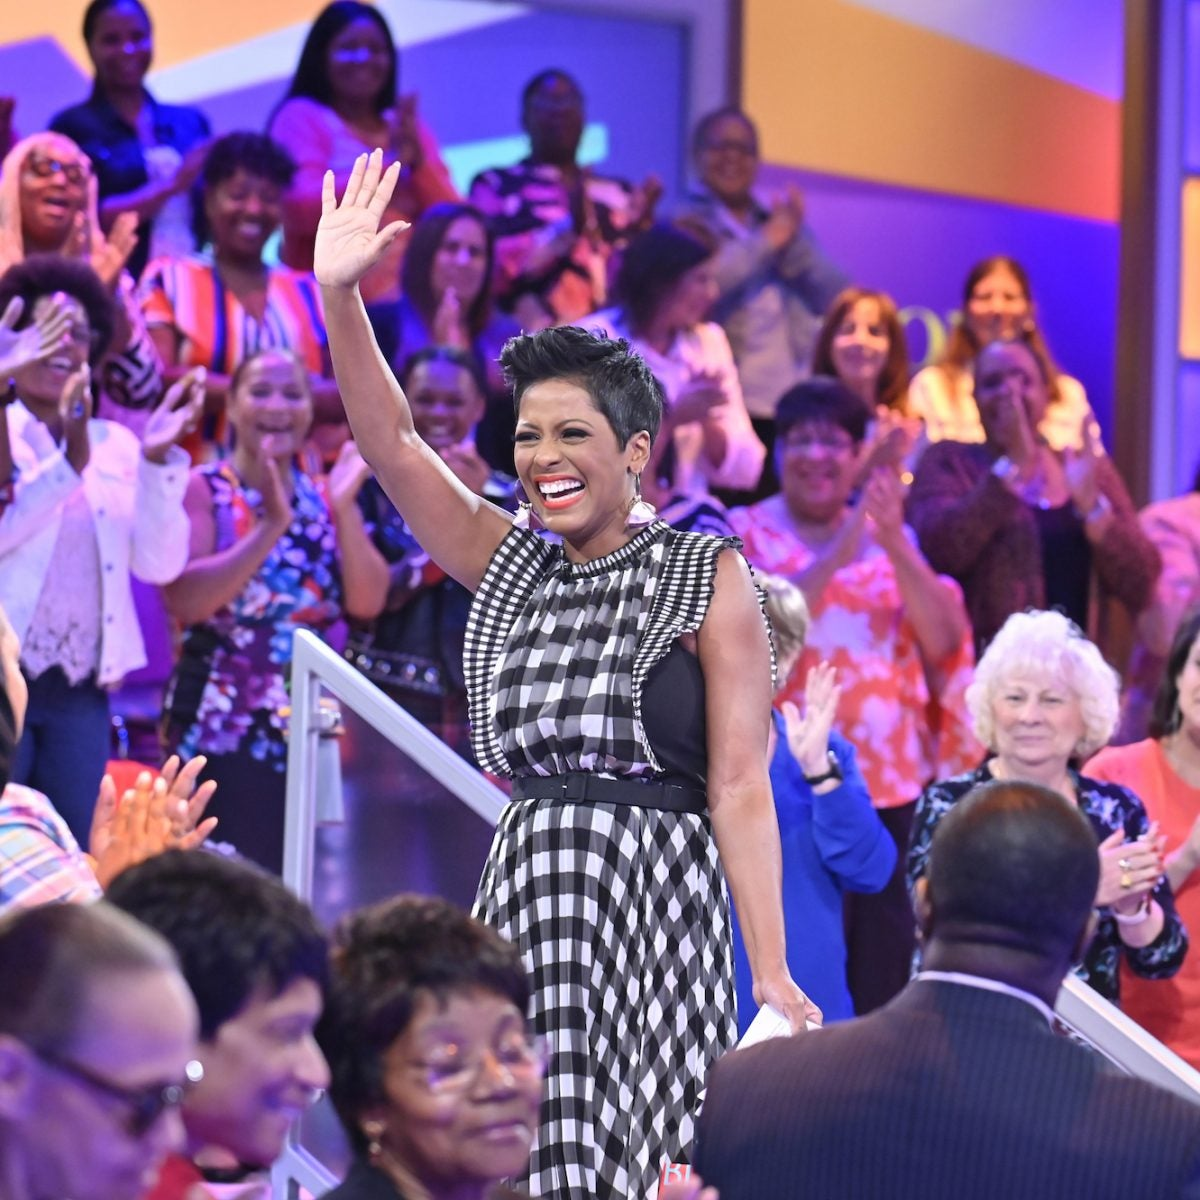 Tamron Hall Accepts Daytime Emmy Award Wearing Plush Bathrobe